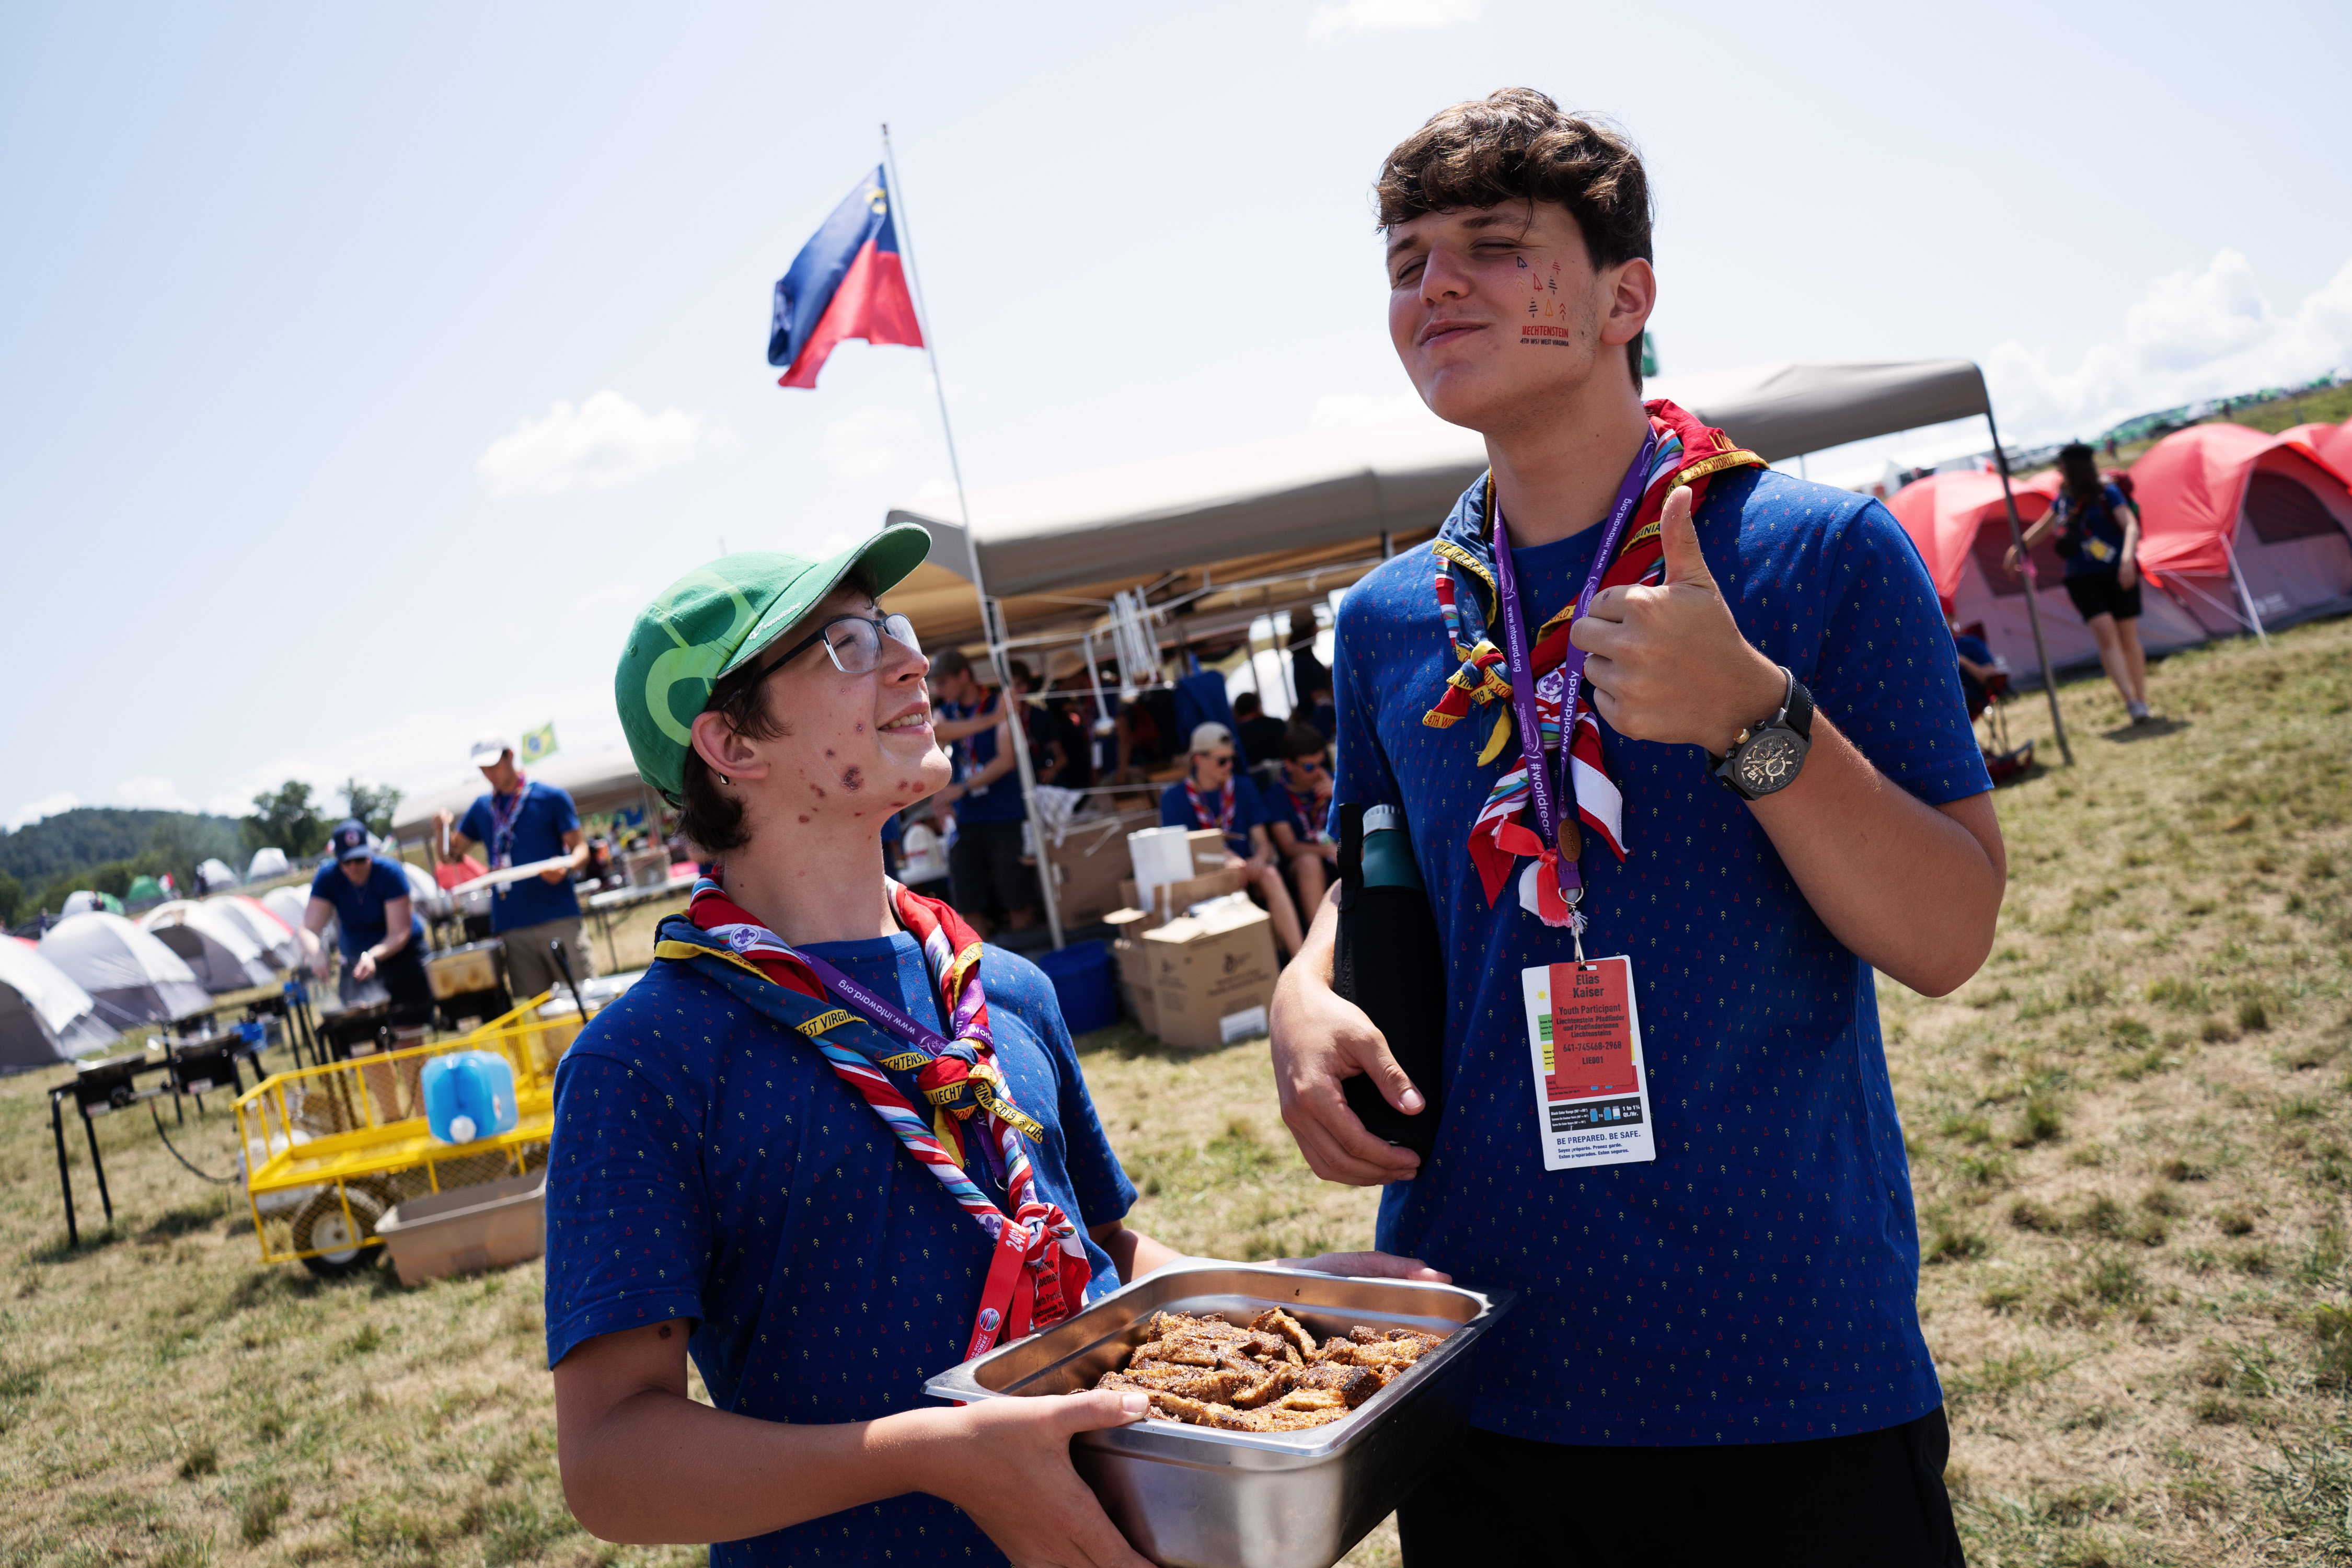 Jamboree_CulturalCelebrationDay_0061.jpg